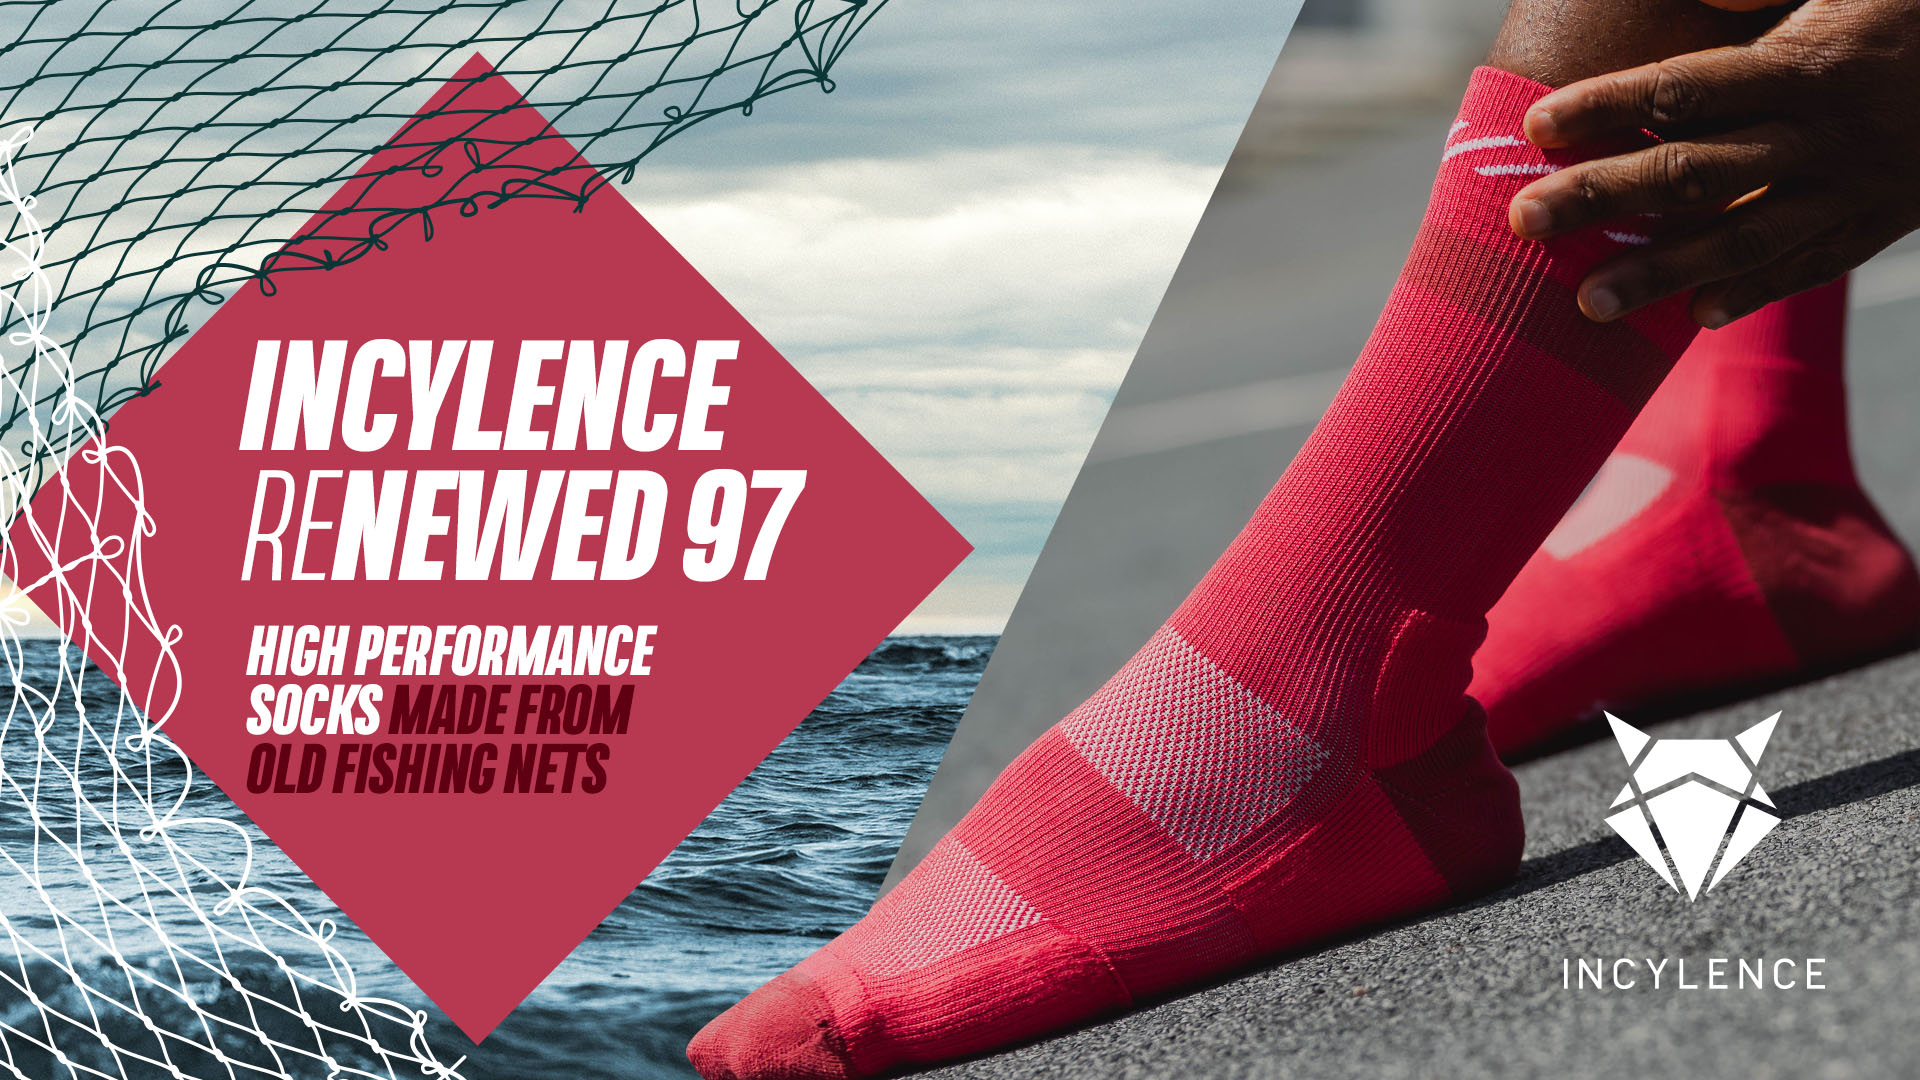 Incylence startet erfolgreich Kickstarter-Kampagne